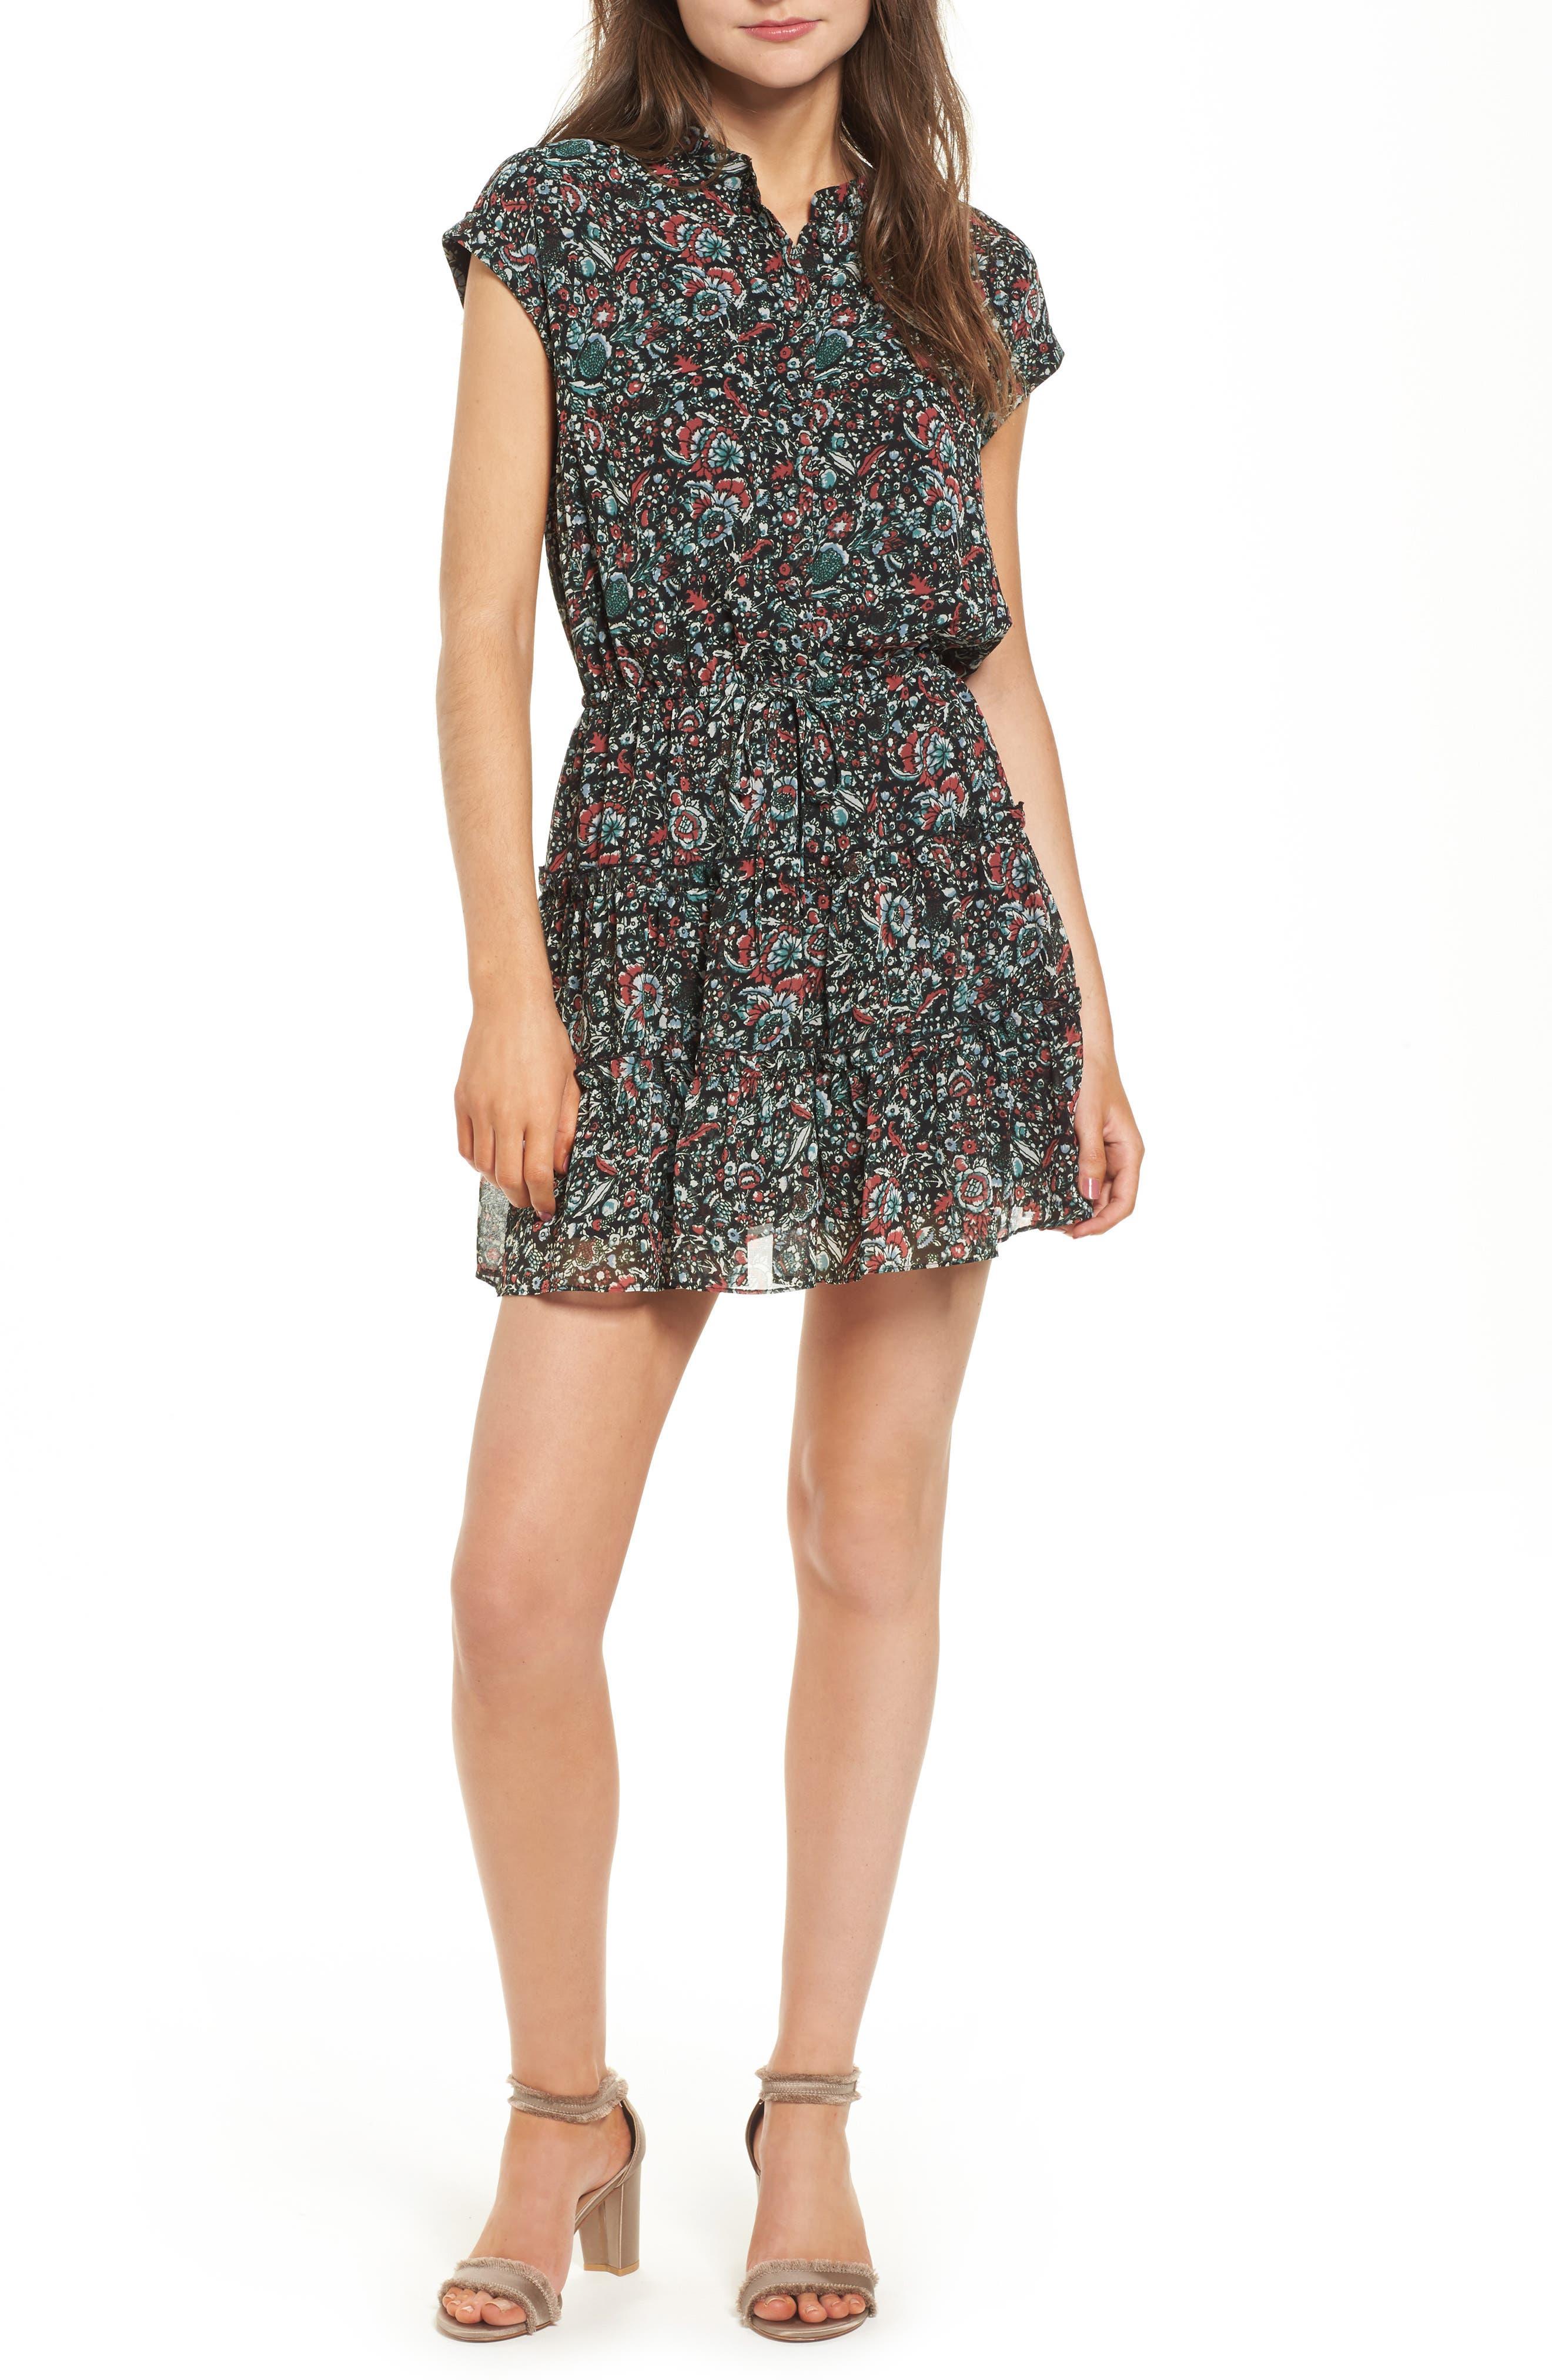 Ollie Dress,                             Main thumbnail 1, color,                             002